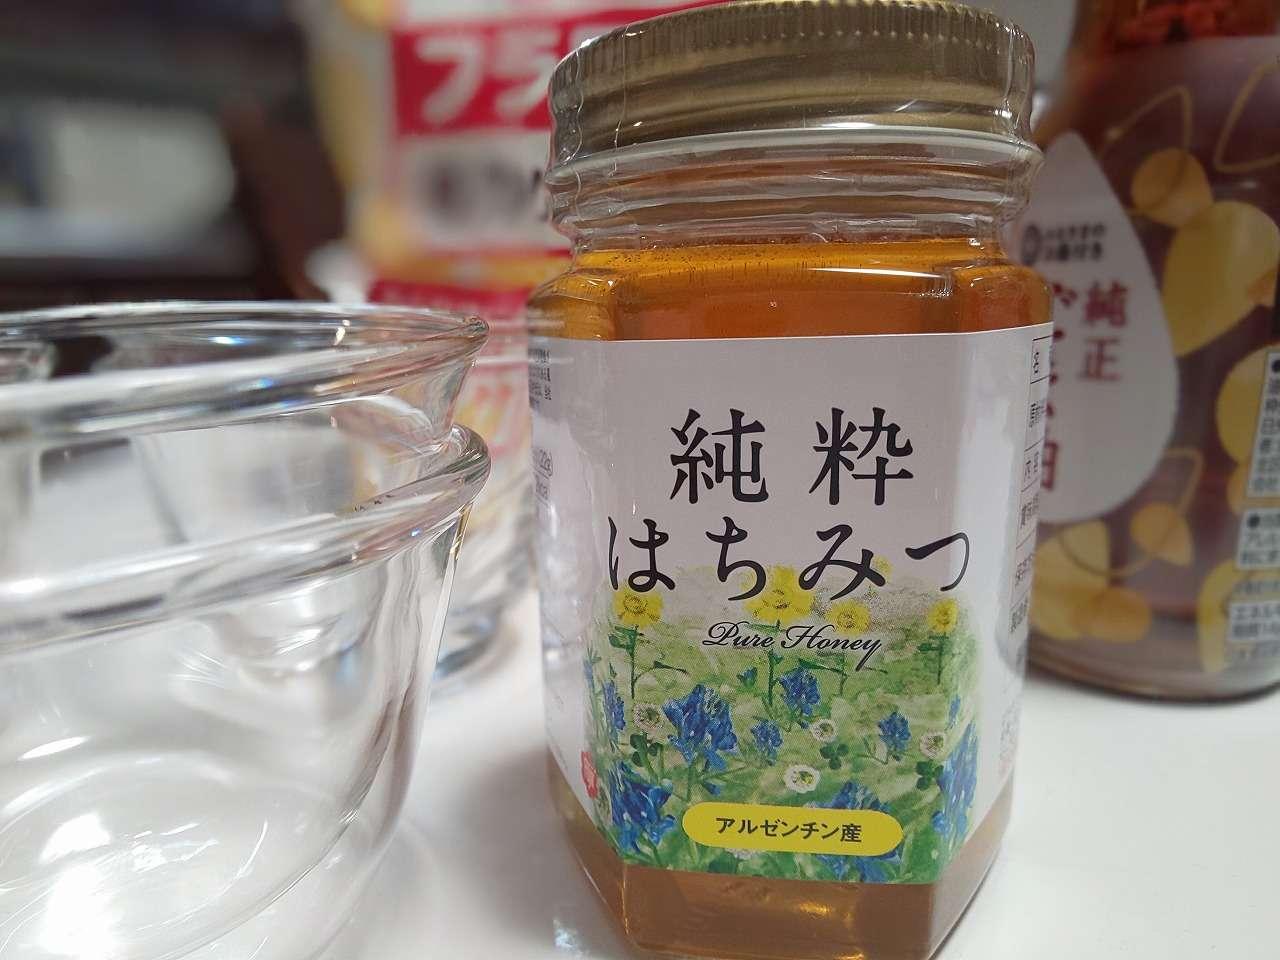 image ハチミツからの~お菓子作り